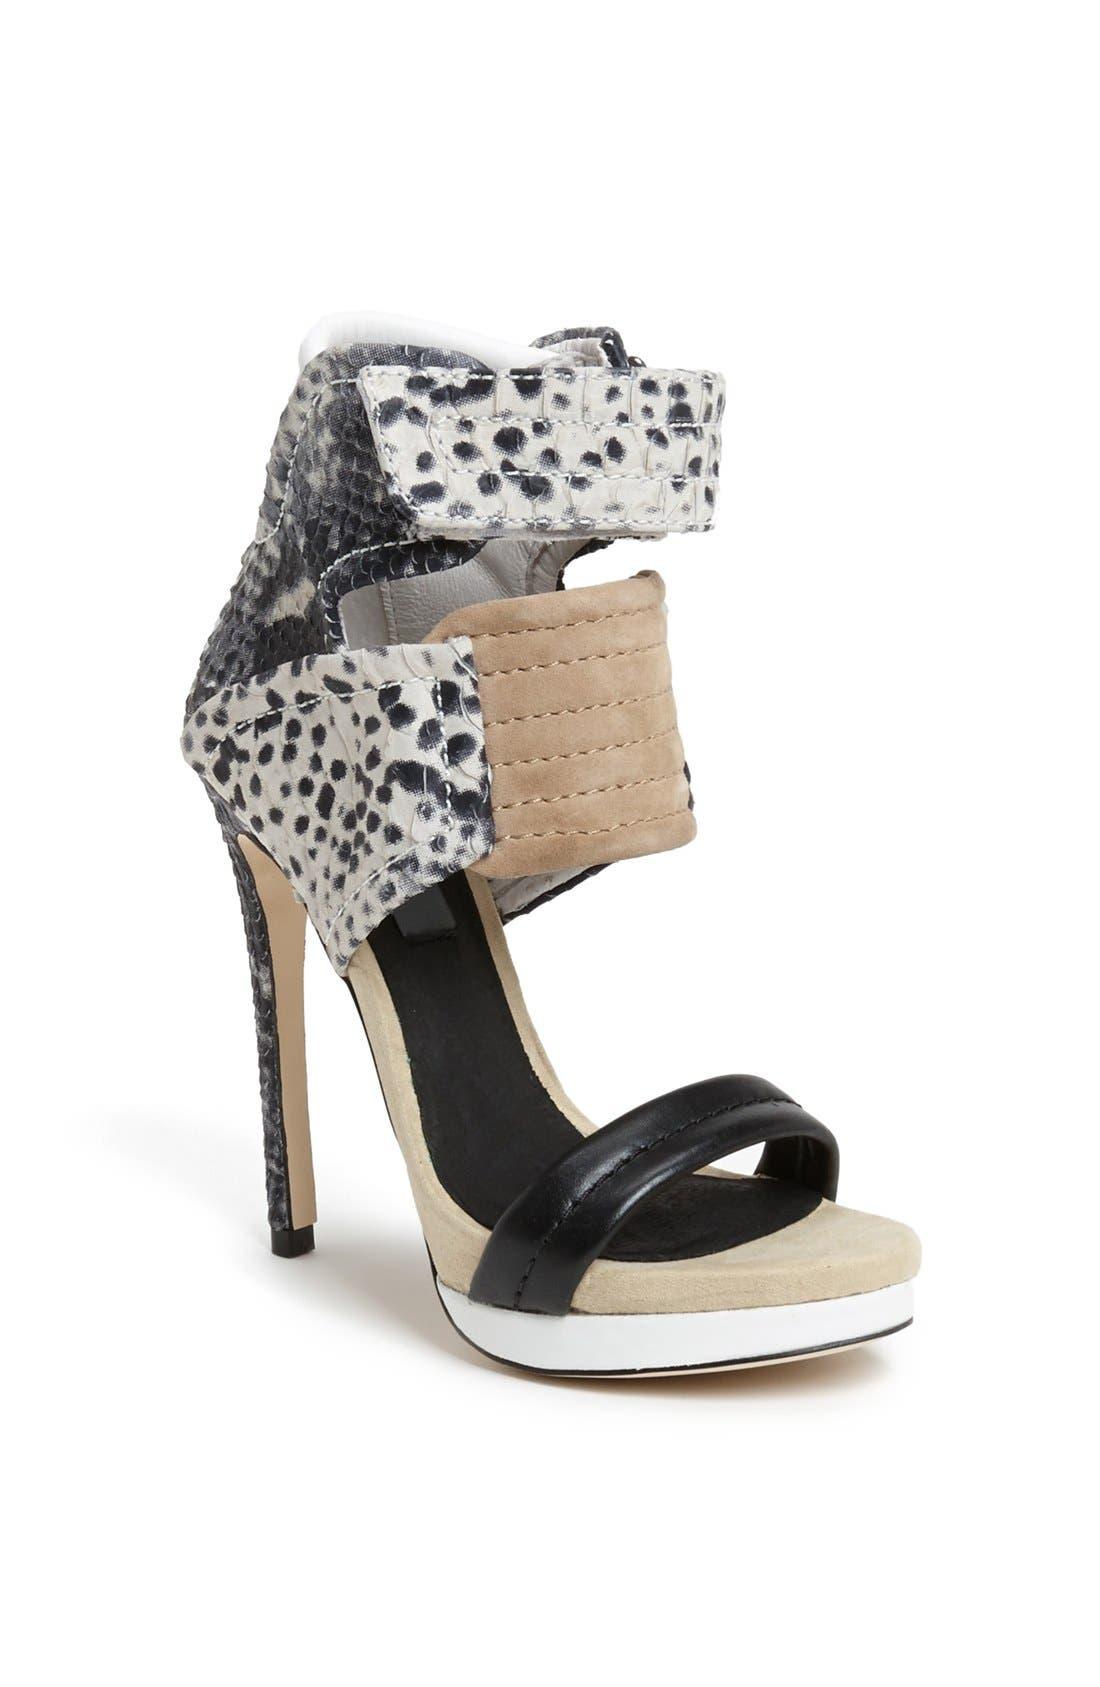 Alternate Image 1 Selected - MIA Limited Edition 'Rocco' Platform Sandal